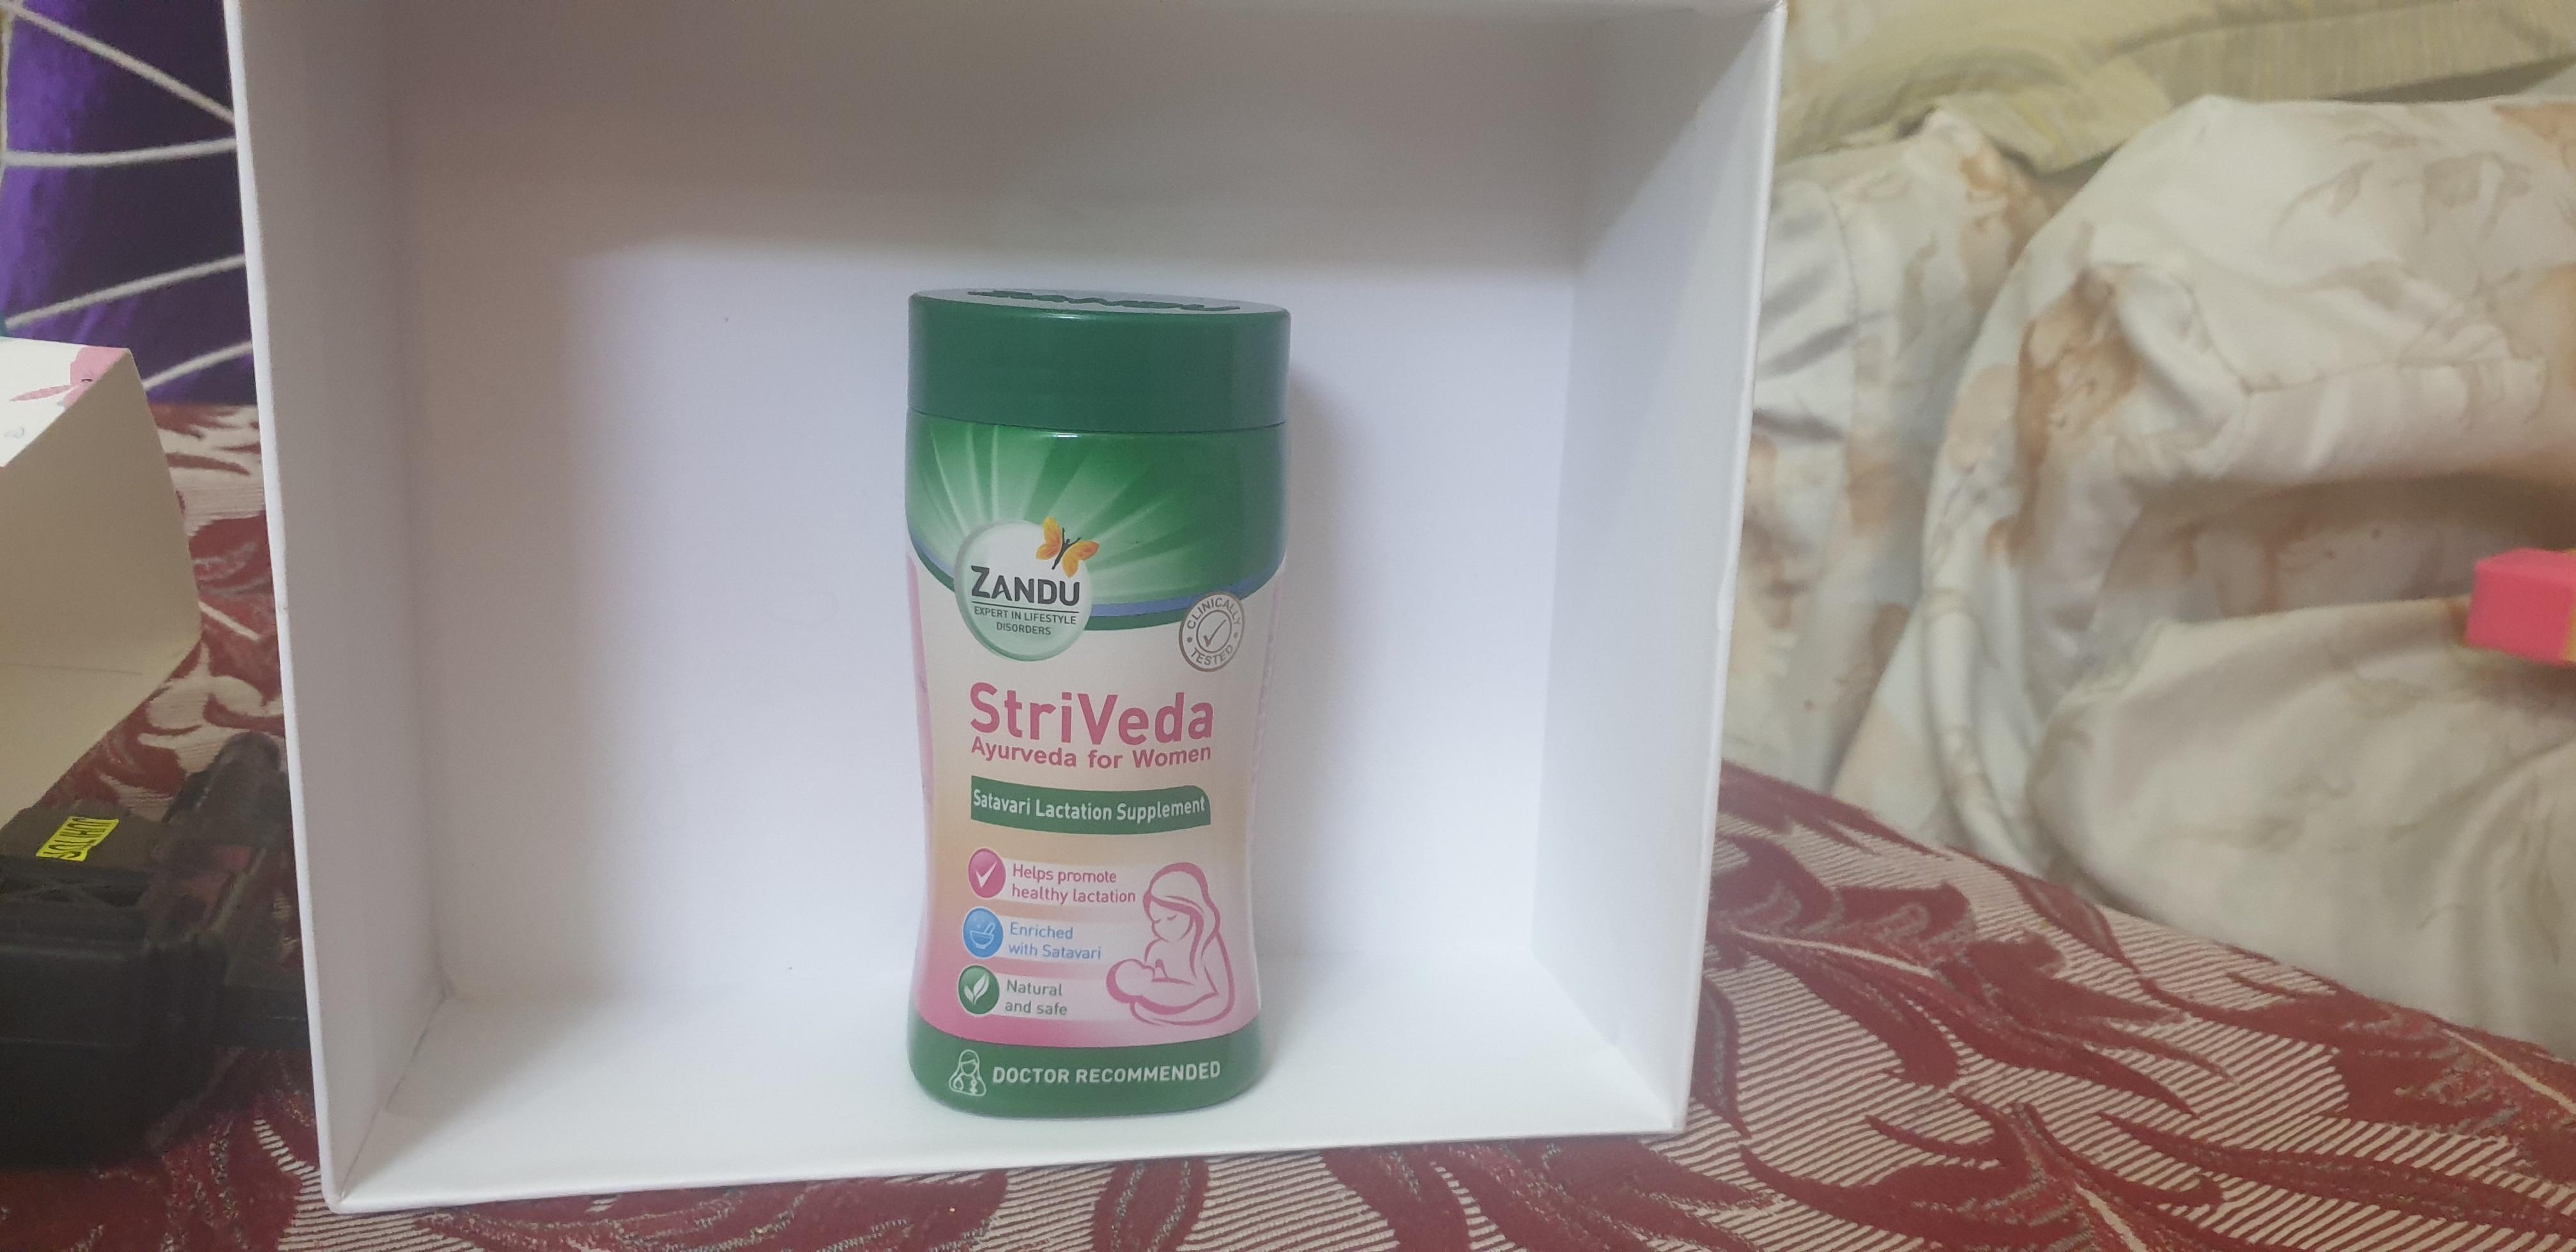 Zandu StriVeda Satavari Lactation Supplement-Awesome product Launched by Zandu for breastfeeding mothers-By mansikhanna9